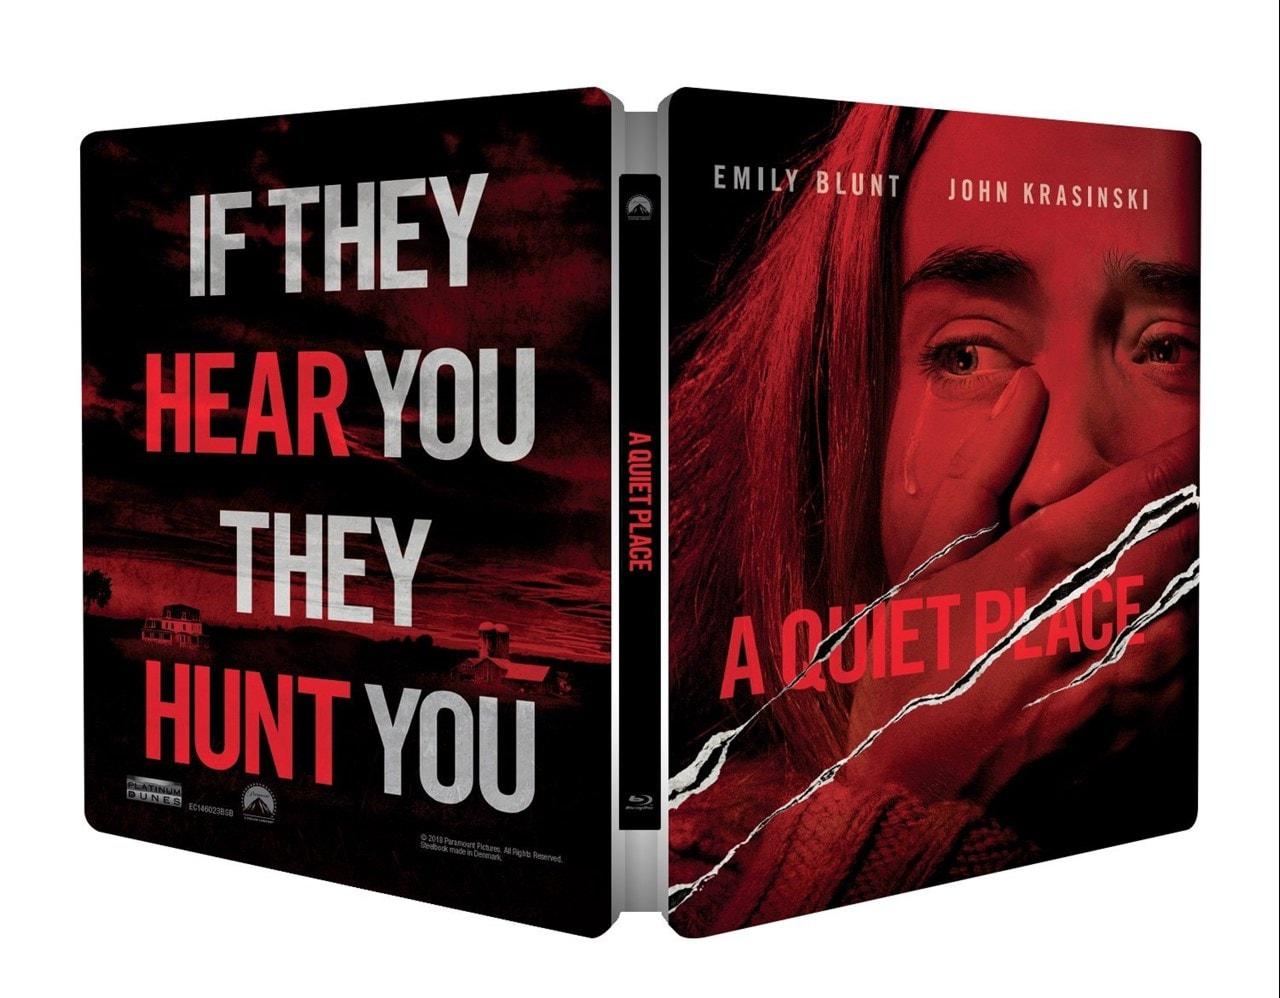 A Quiet Place (hmv Exclusive) Limited Edition Steelbook - 2